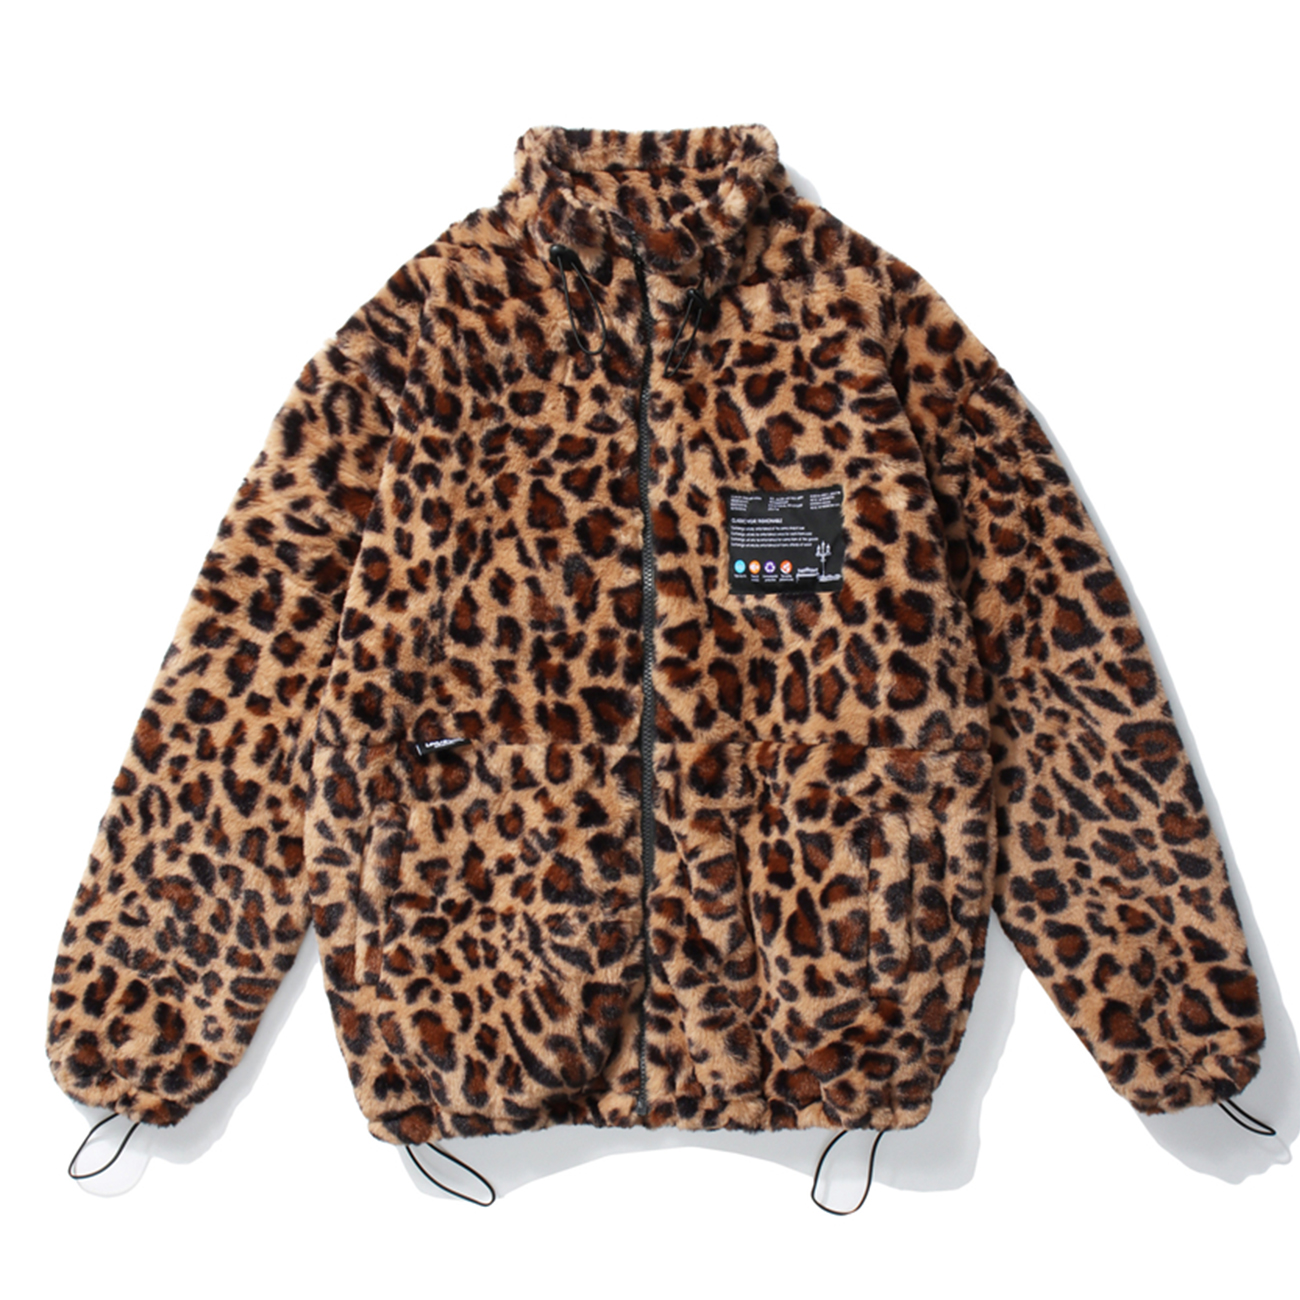 Streetwear Leopard Print Zip Up Cardigan Coats Hip Hop Lambswool Jacket Coats Men Autumn Winter Harajuku Loose Coat Outwear 2020